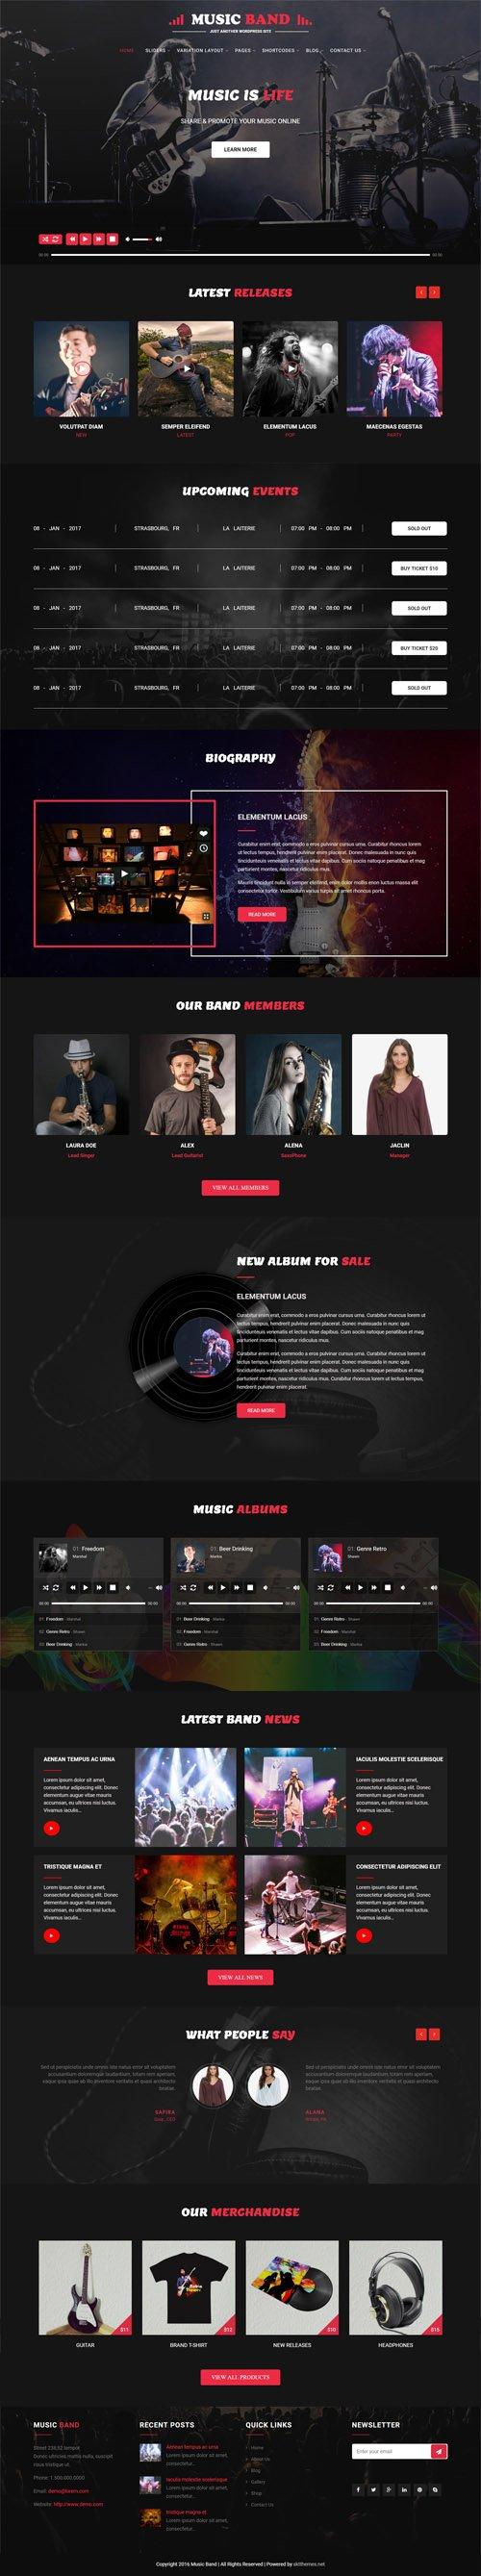 SKT Themes - Music Producer v1.0 - Responsive WordPress Theme